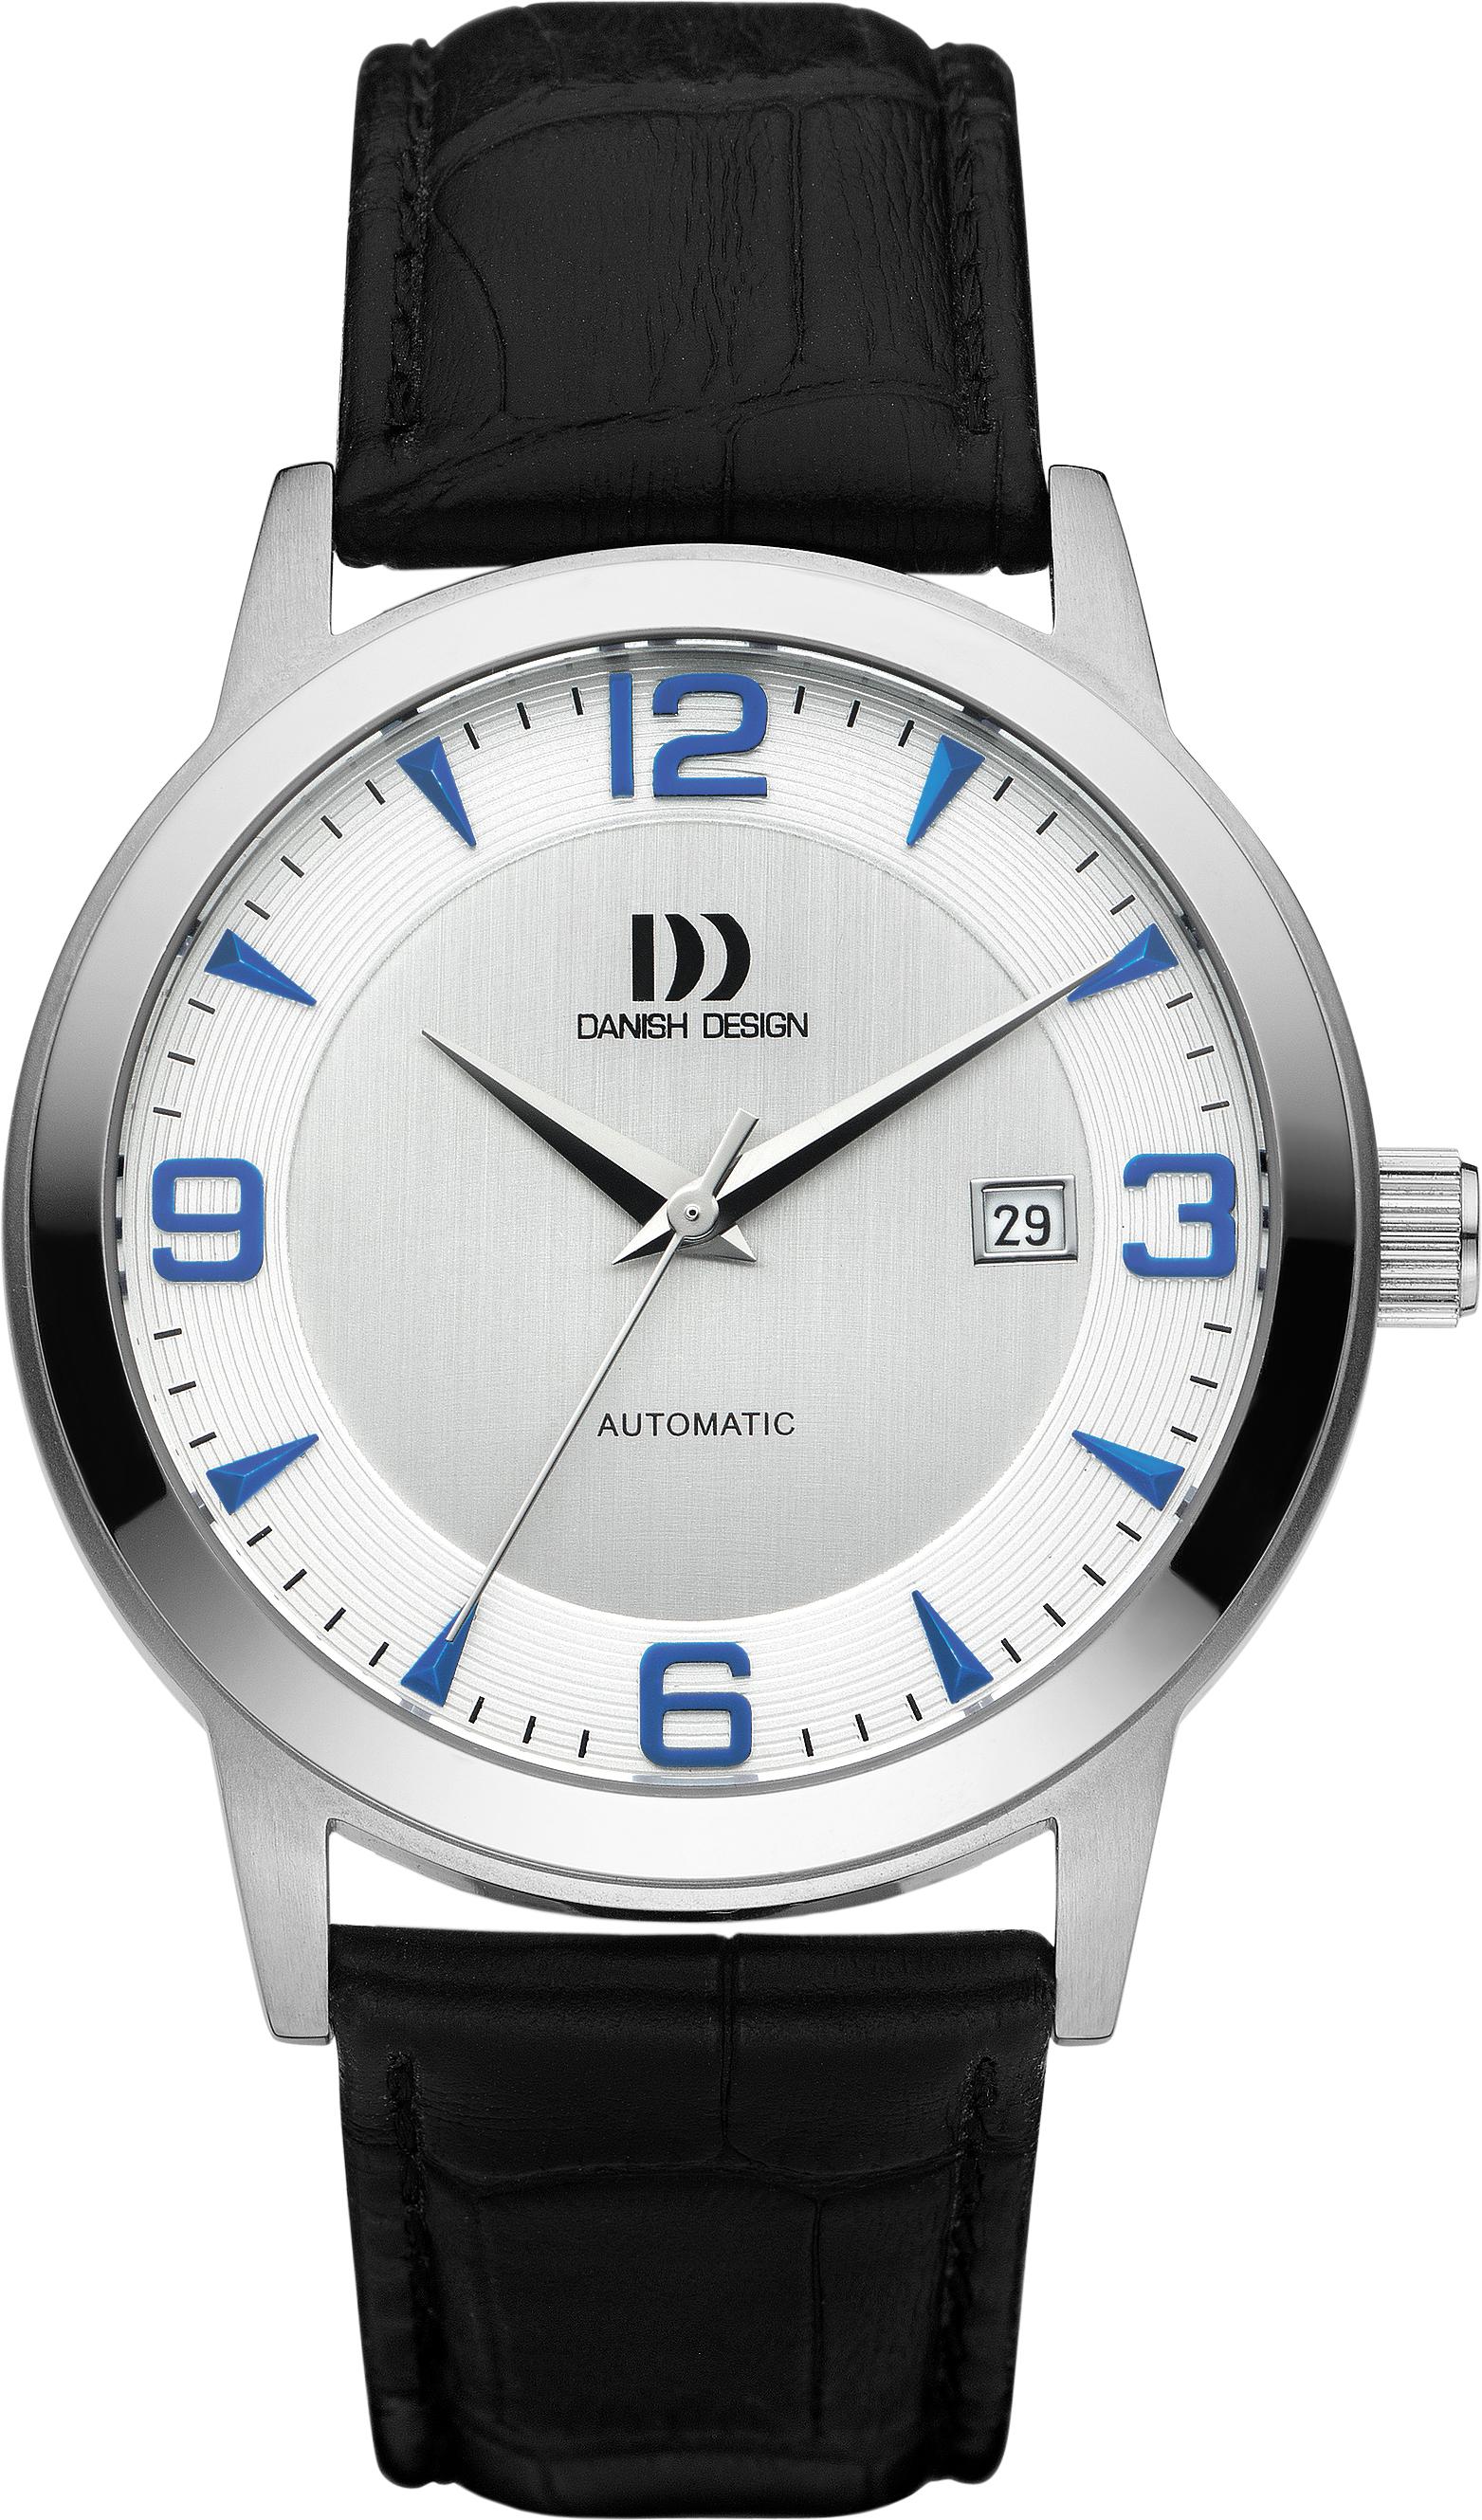 75f46cb6bc8 DANISH DESIGN Pánské Automatické hodinky IQ22Q1083 Danish Design + dárek  zdarma